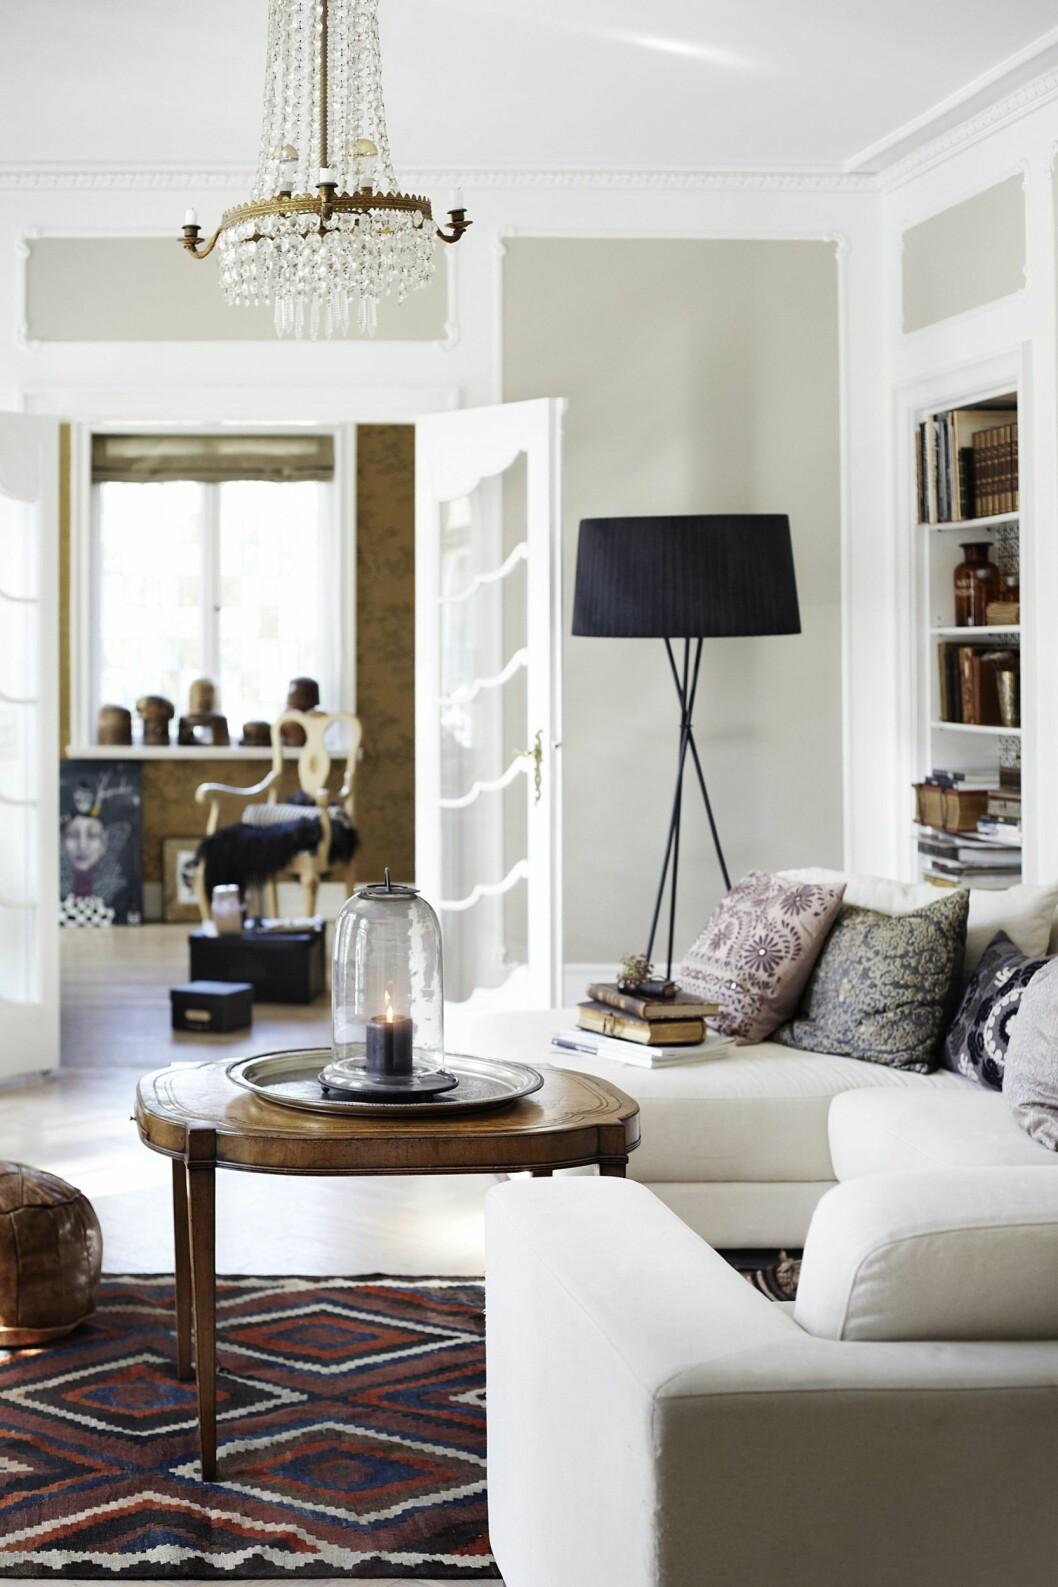 ATELIERET: En titt inn i Cecilies fantastiske atelierunivers, sett fra stuen. Foto: Kira Brandt Rasmussen